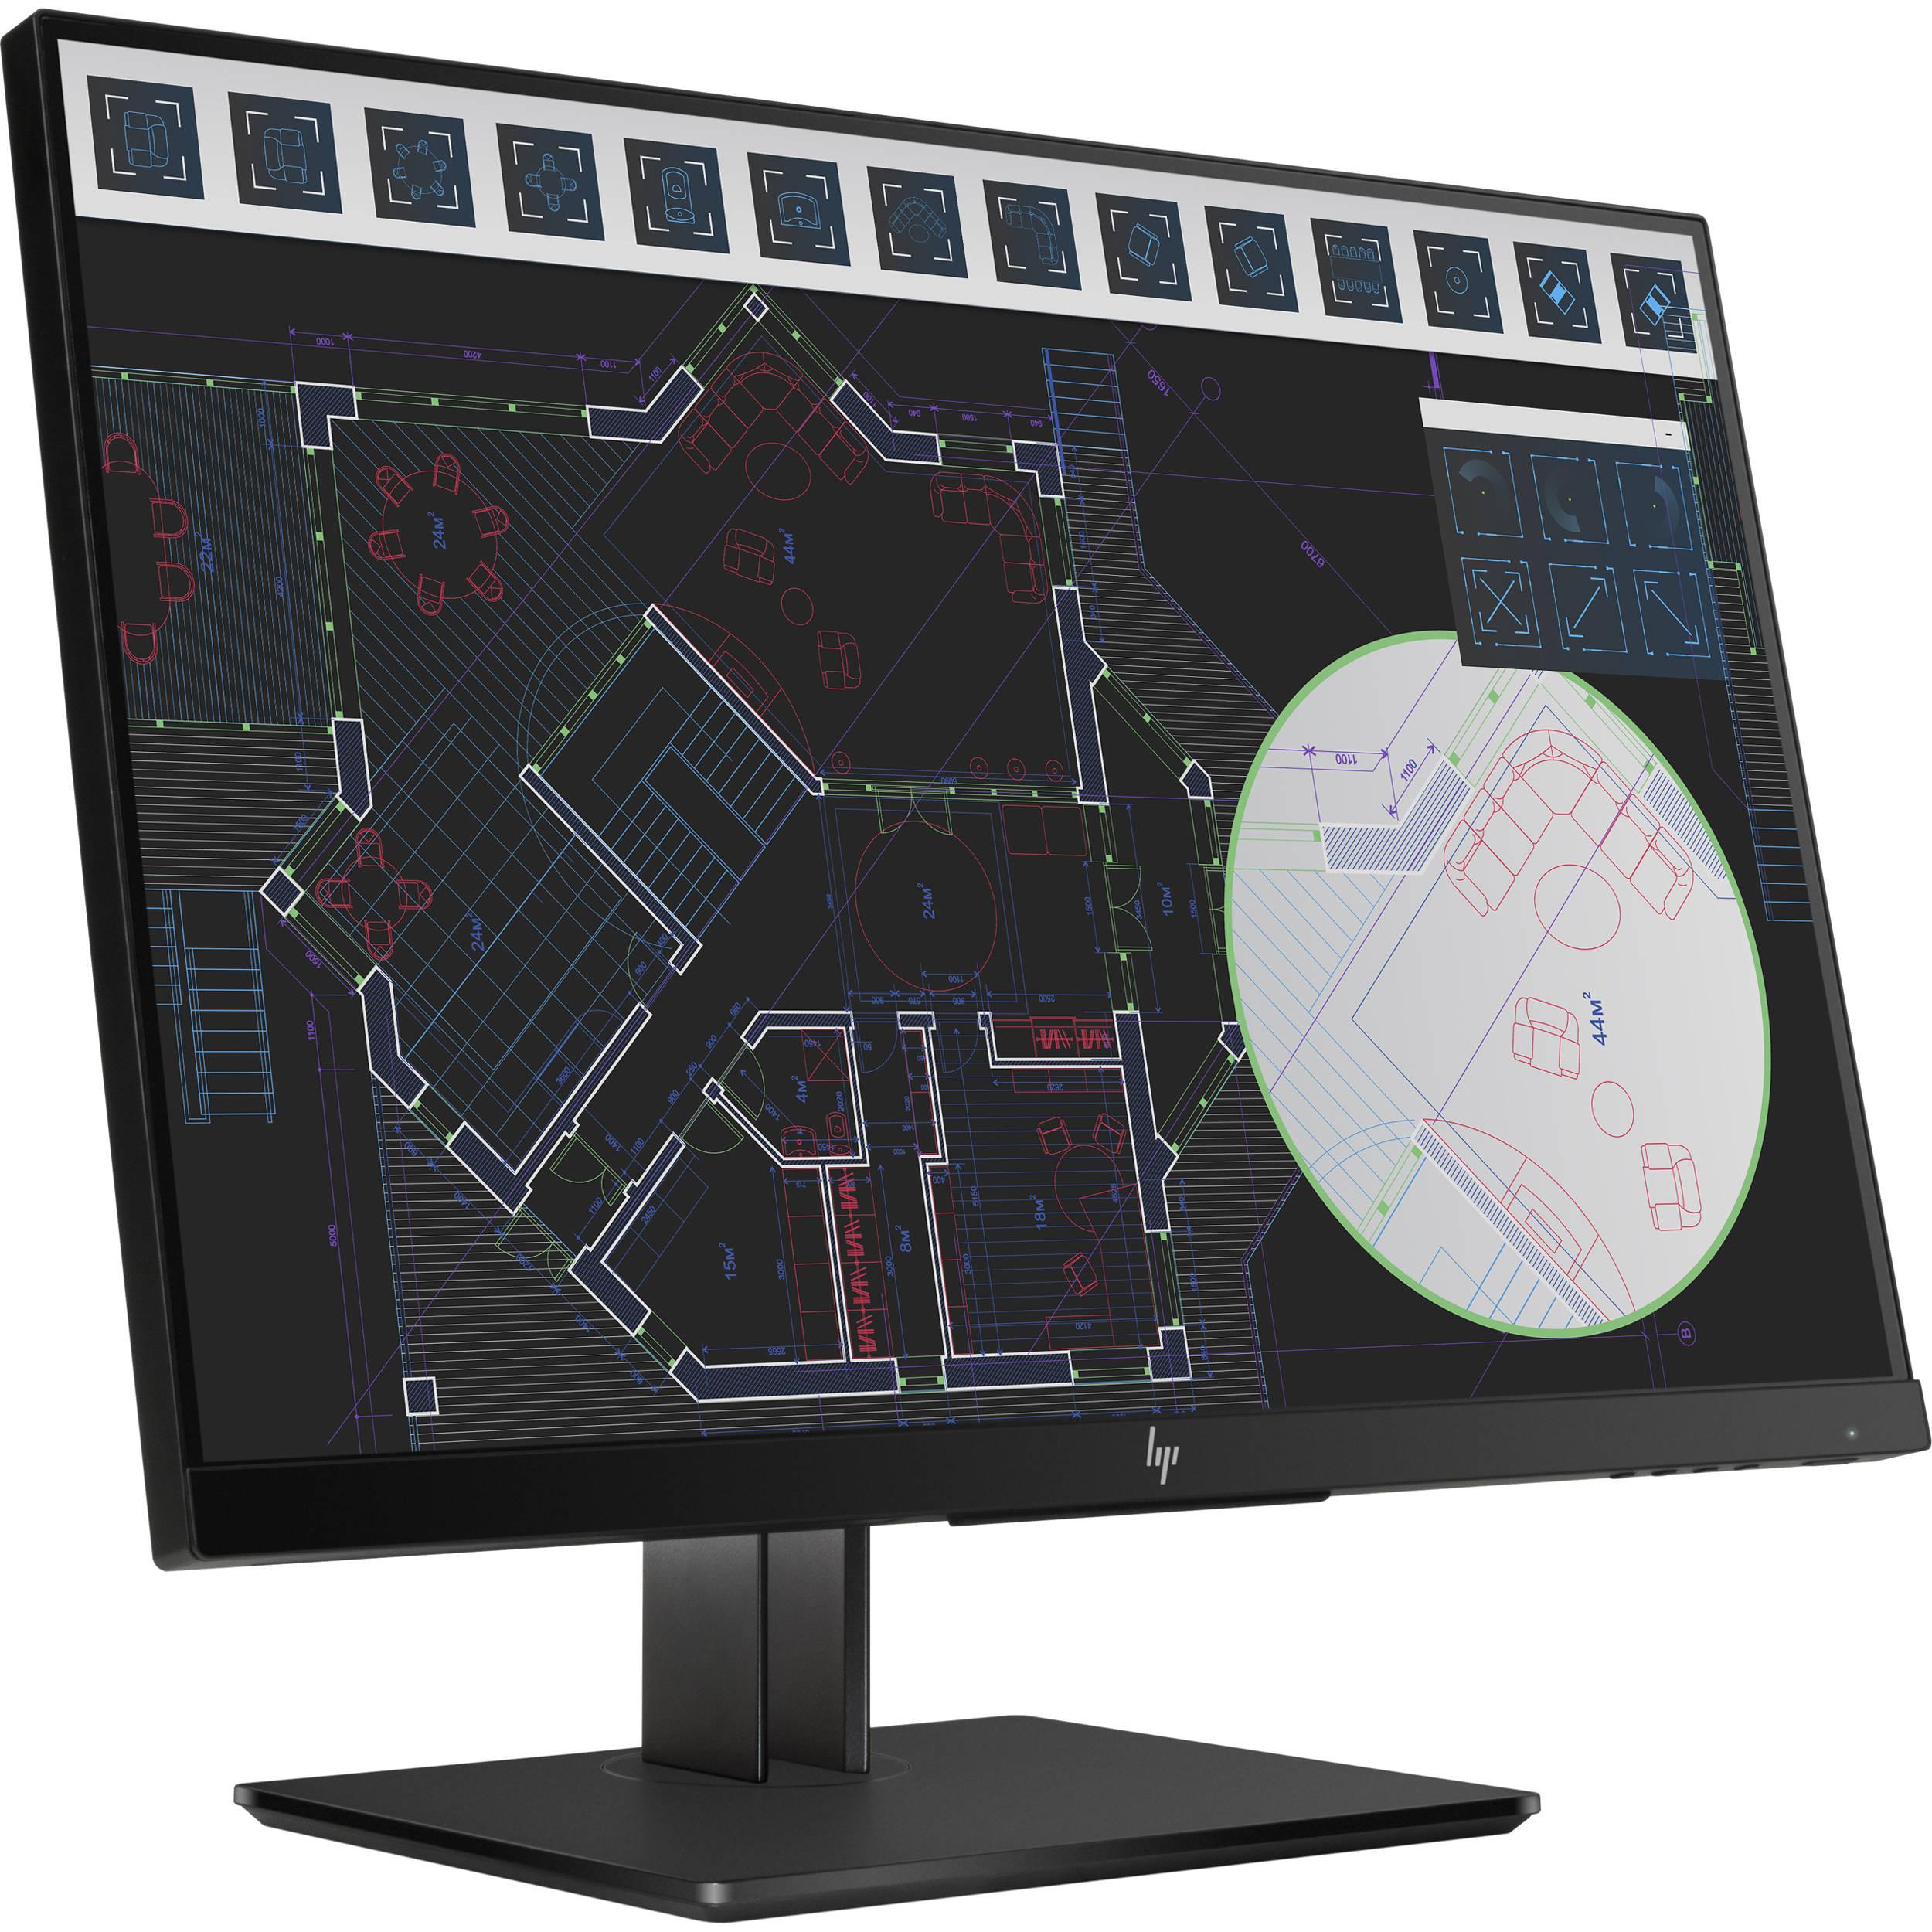 Hp z24i g2 display datasheet